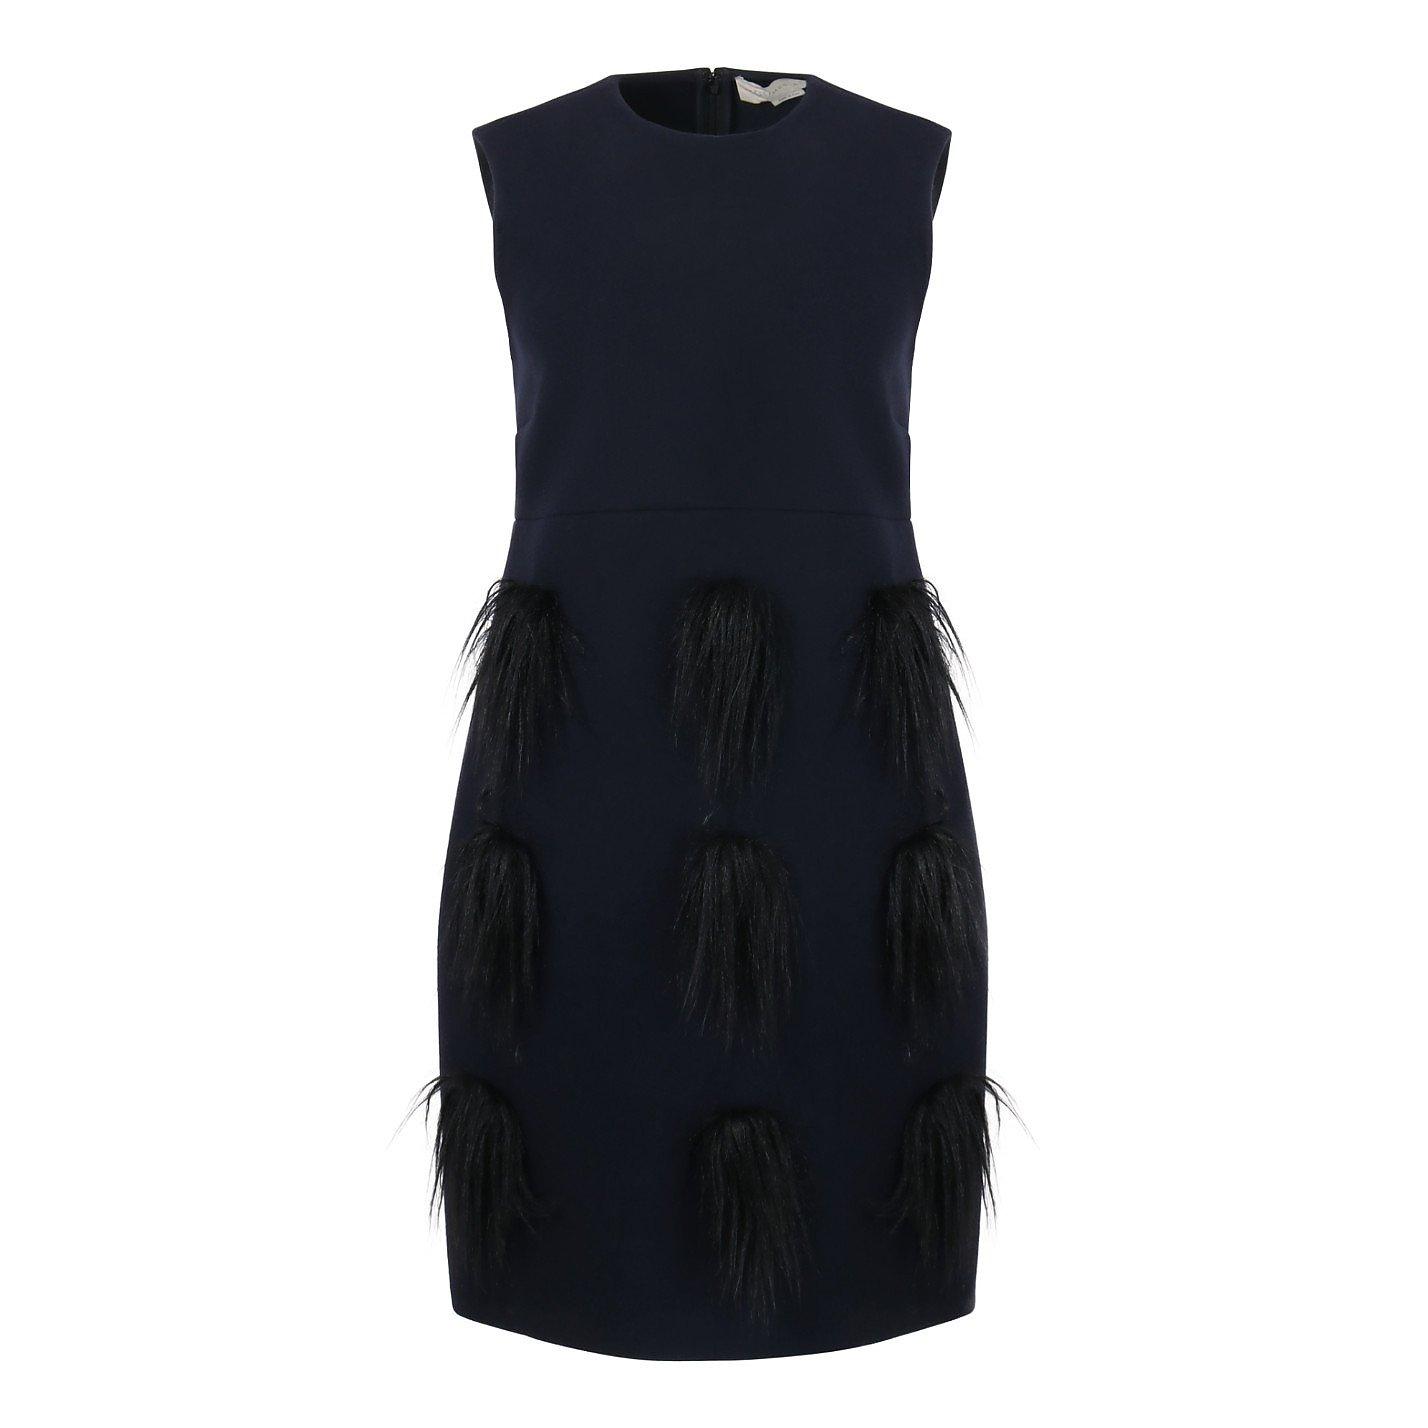 Stella McCartney Wool Dress With Faux Fur Applique